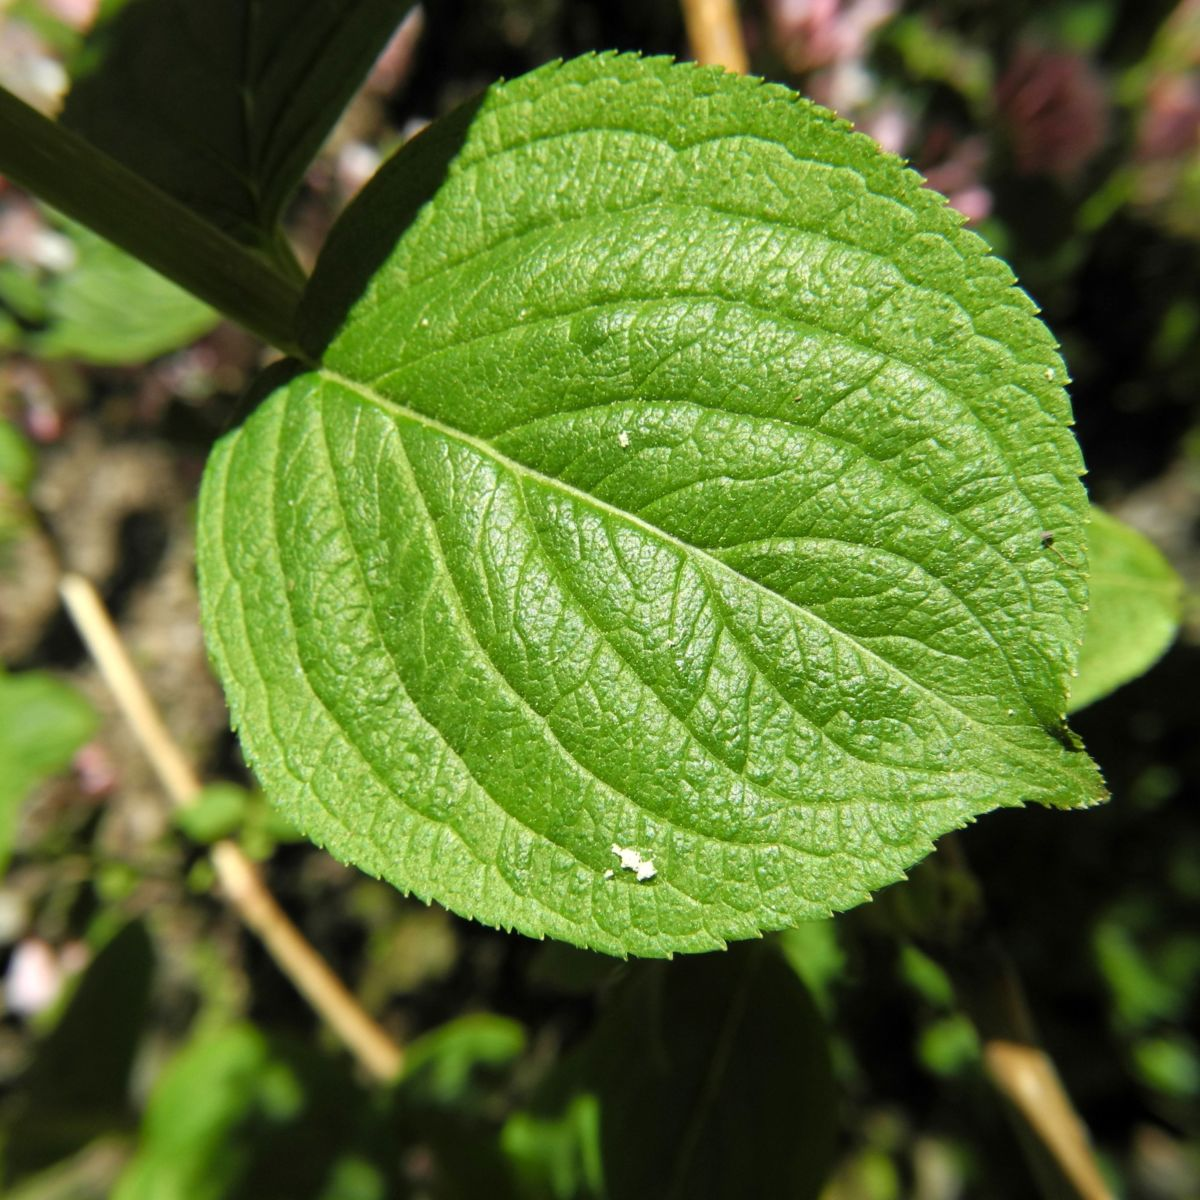 Garten Weigelie Blatt gruen Weigelia hortensis